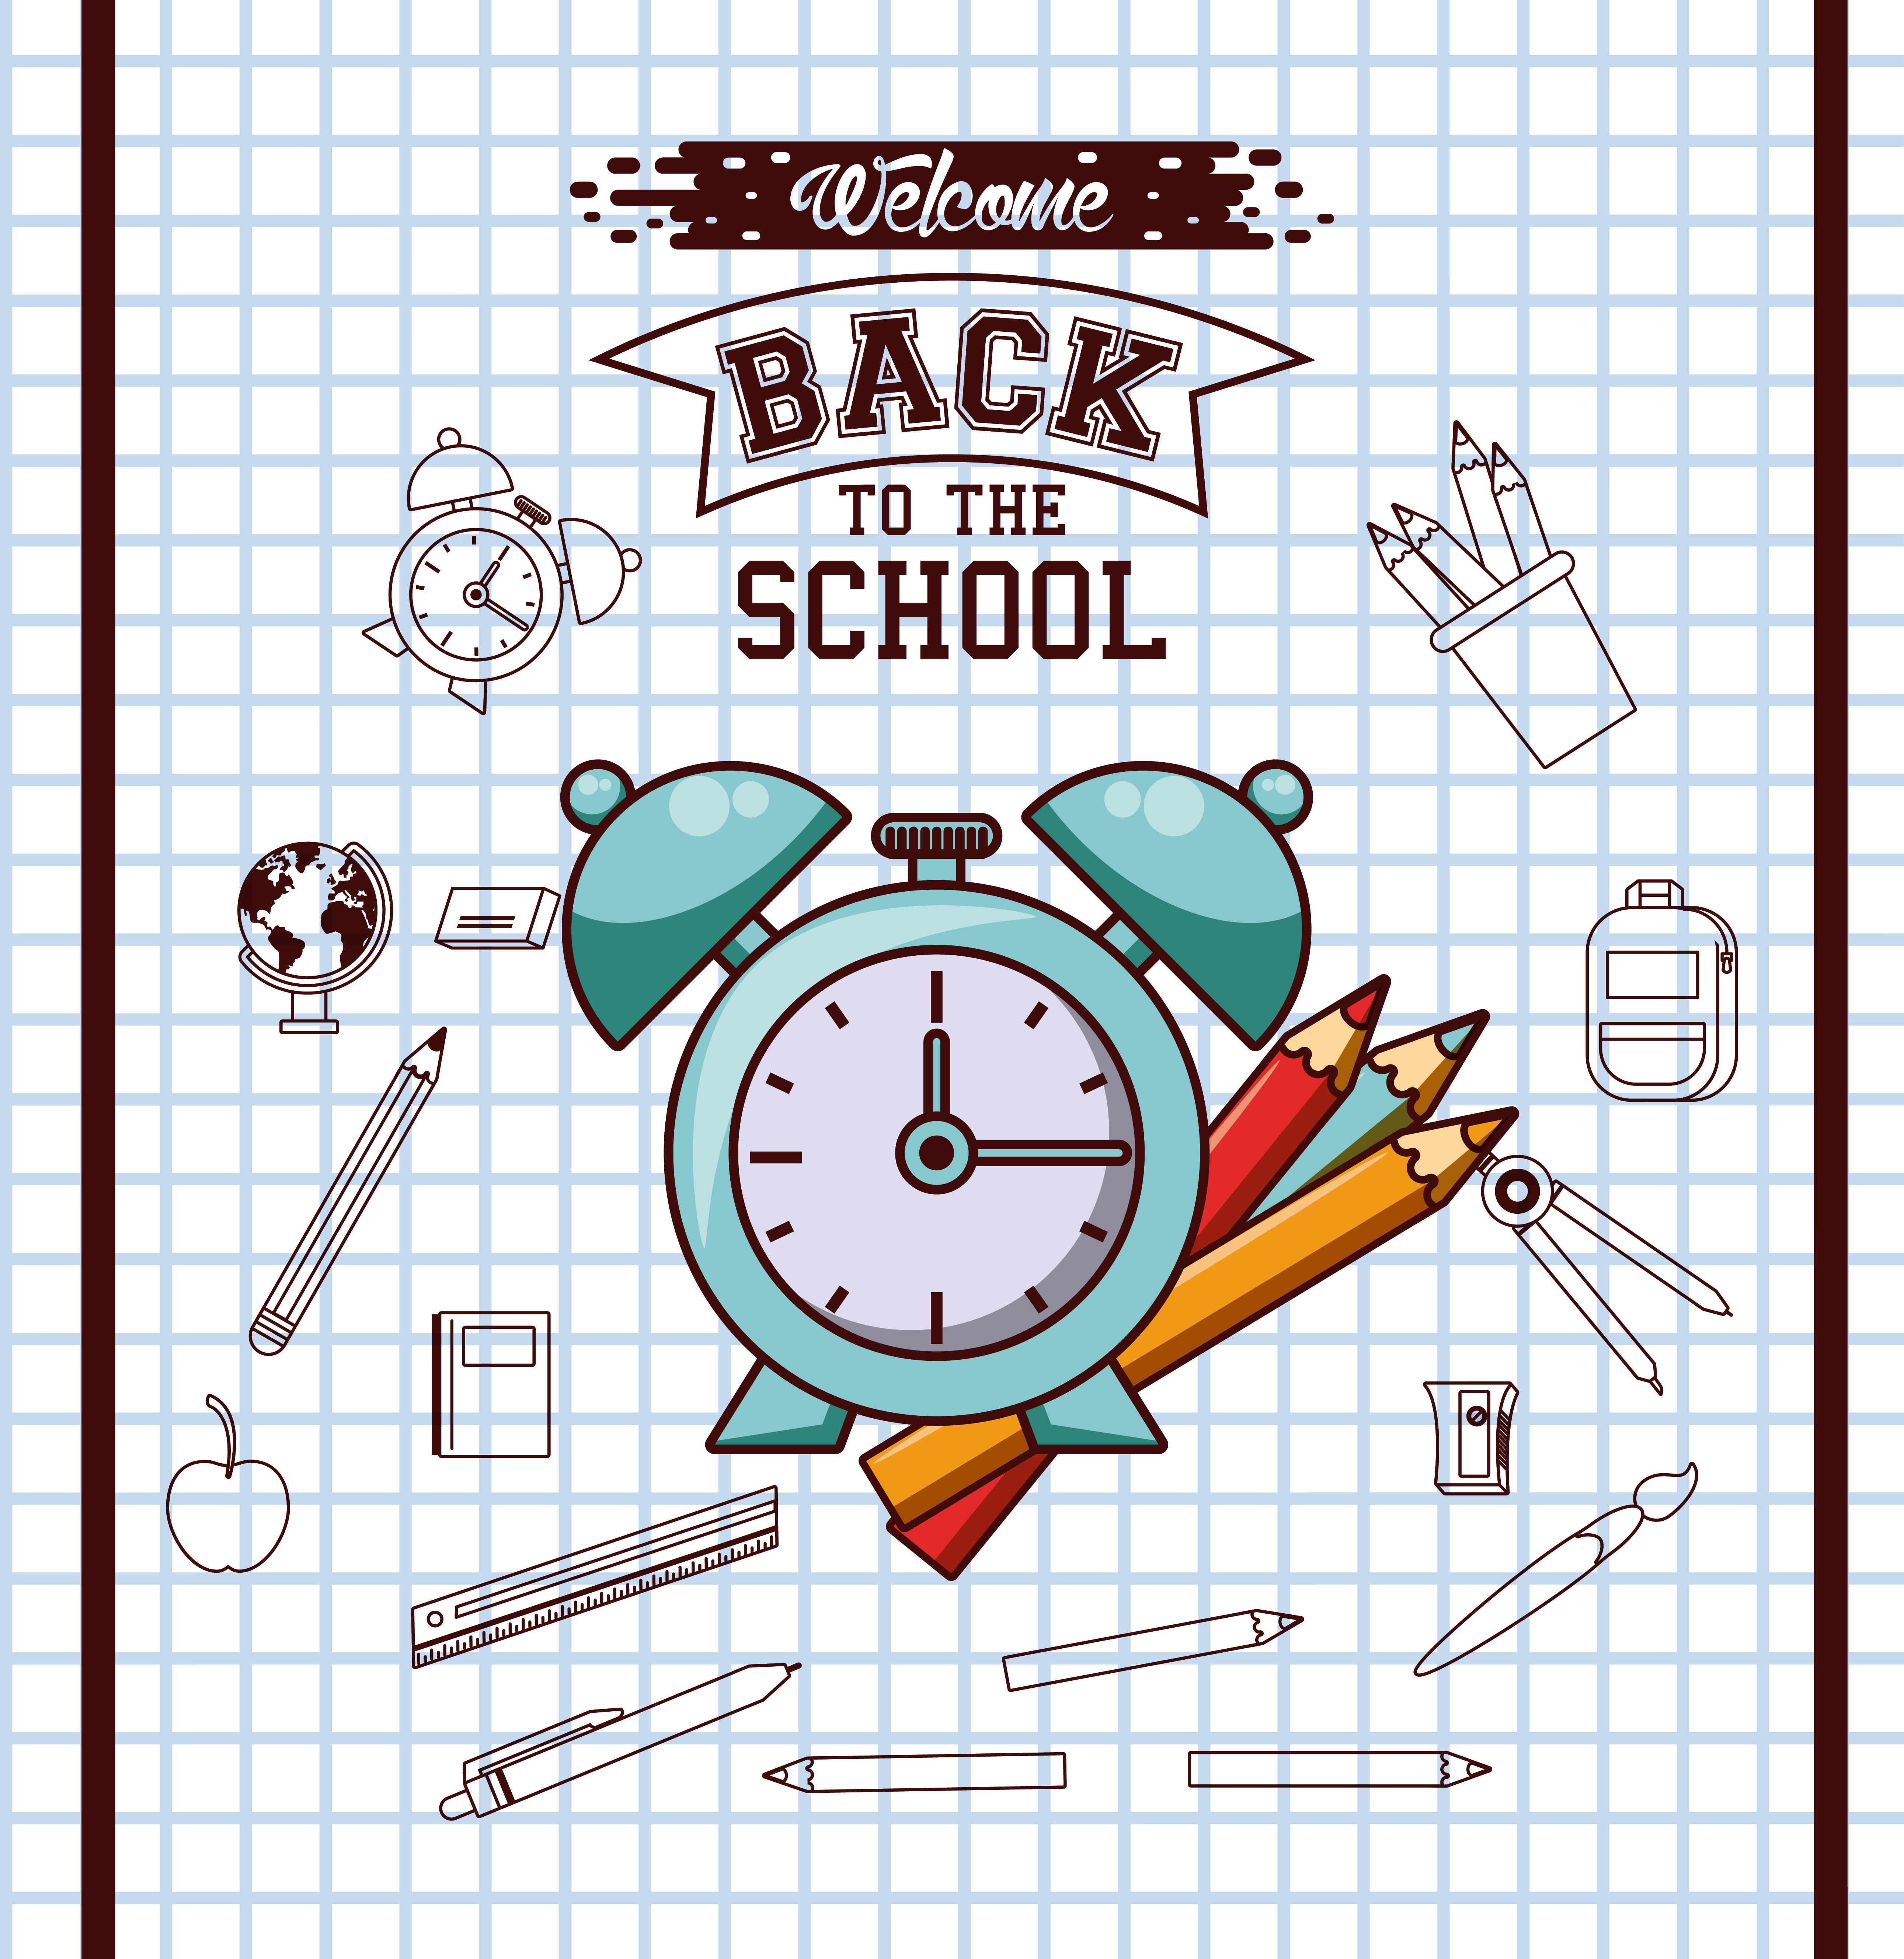 Back to school season poster